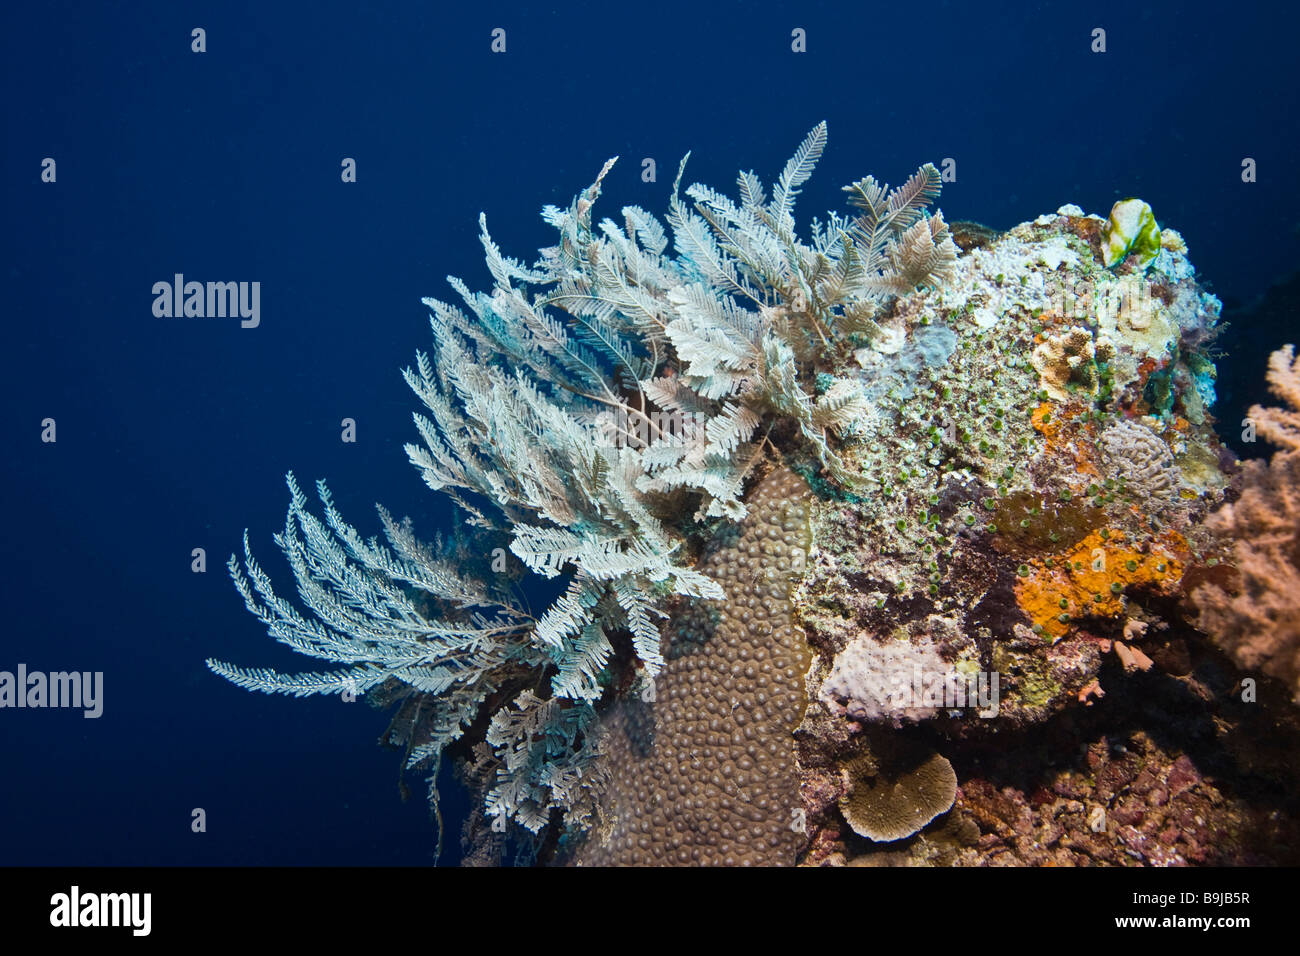 Dangerous marine animal, Stinging Hydroid (Aglaophenia cupressina), Indonesia, south-east Asia - Stock Image